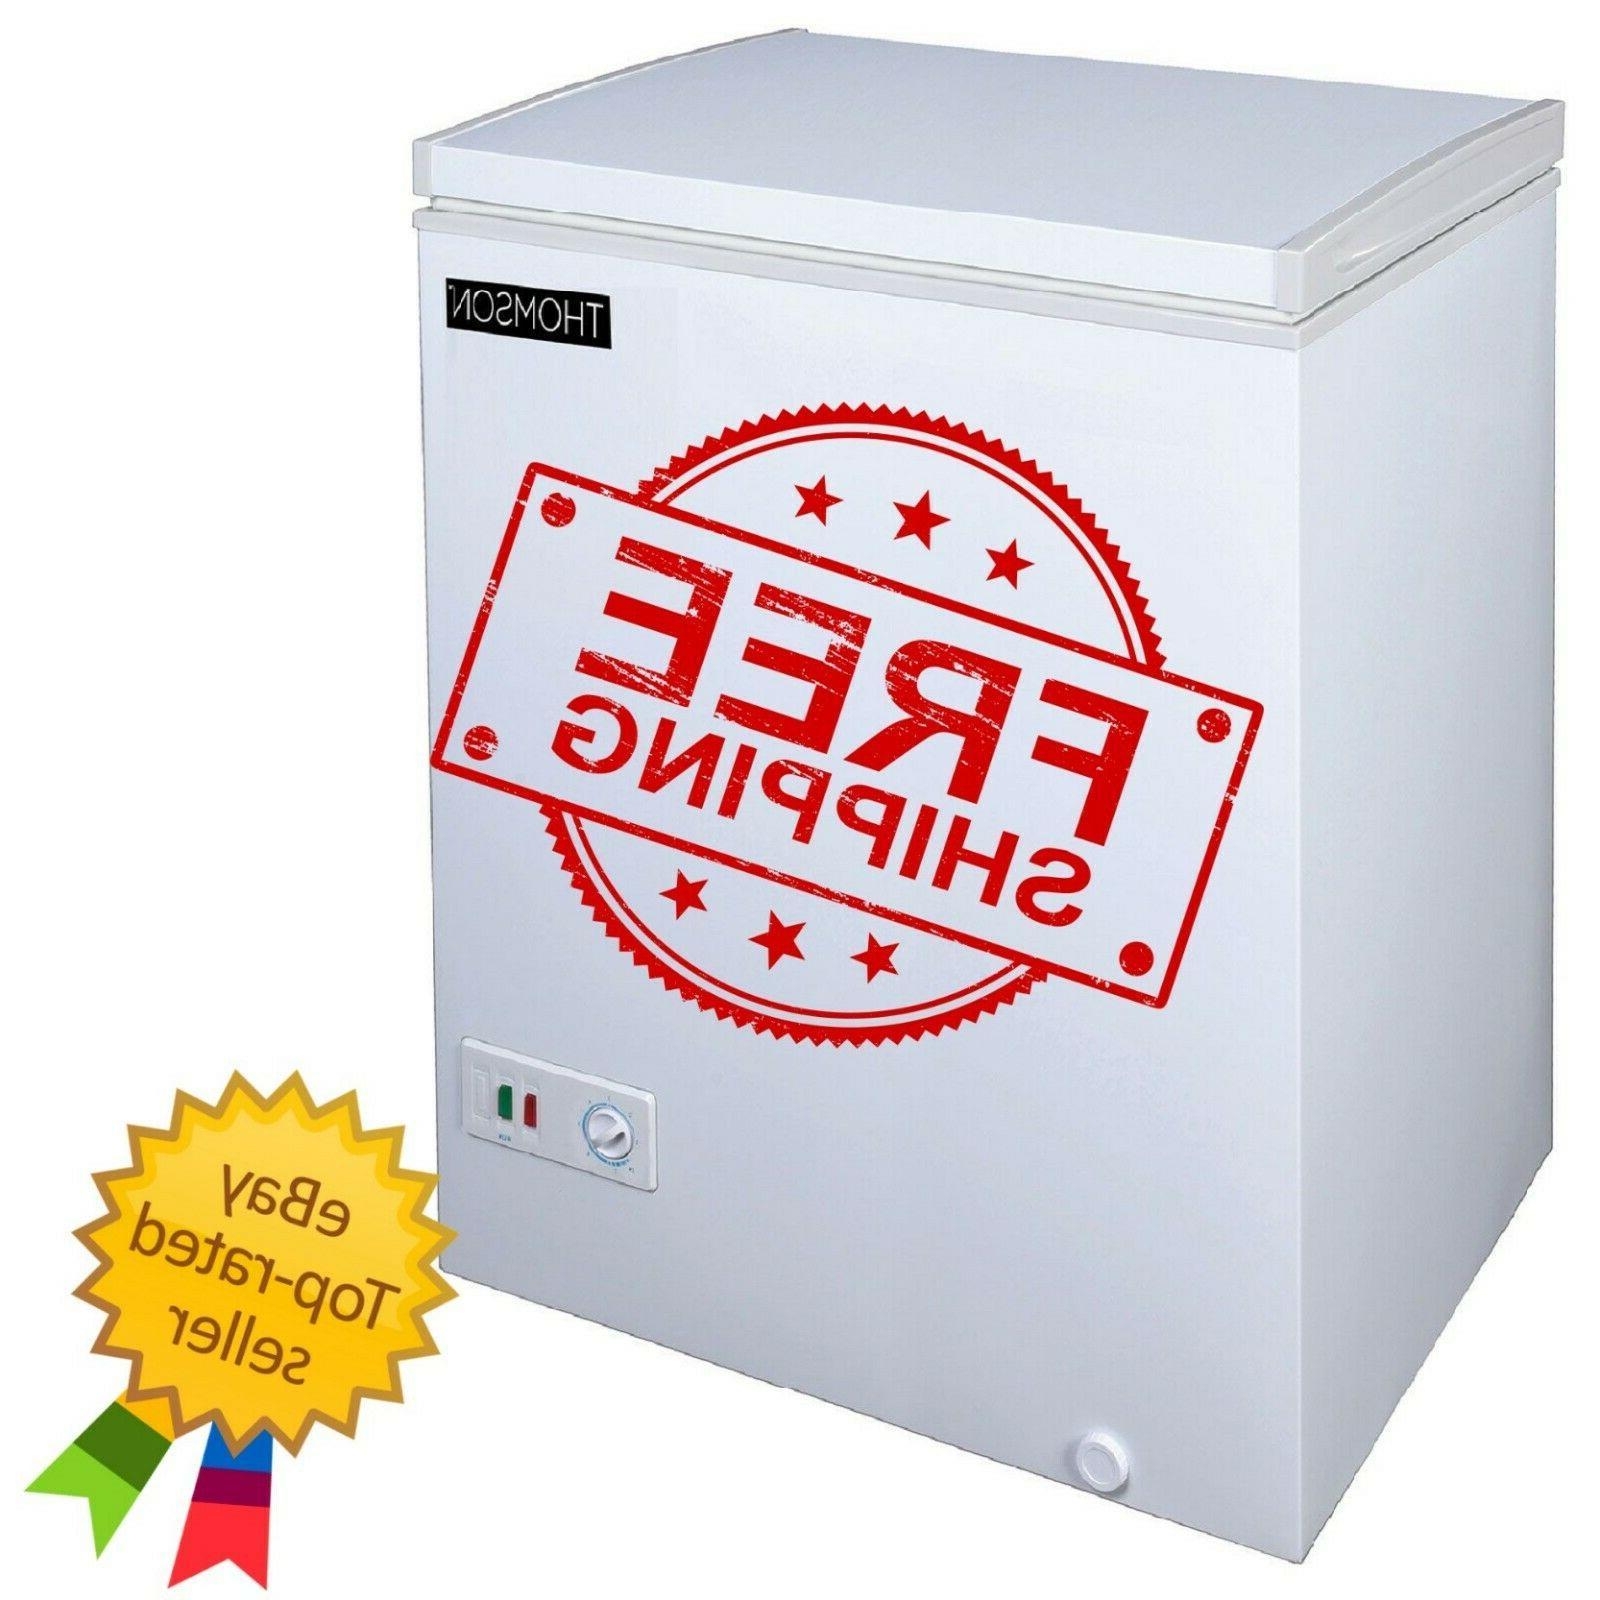 RCA Thomson TFRF520 Chest Deep Freezer Ft 5.0 Cu White Capacity 5